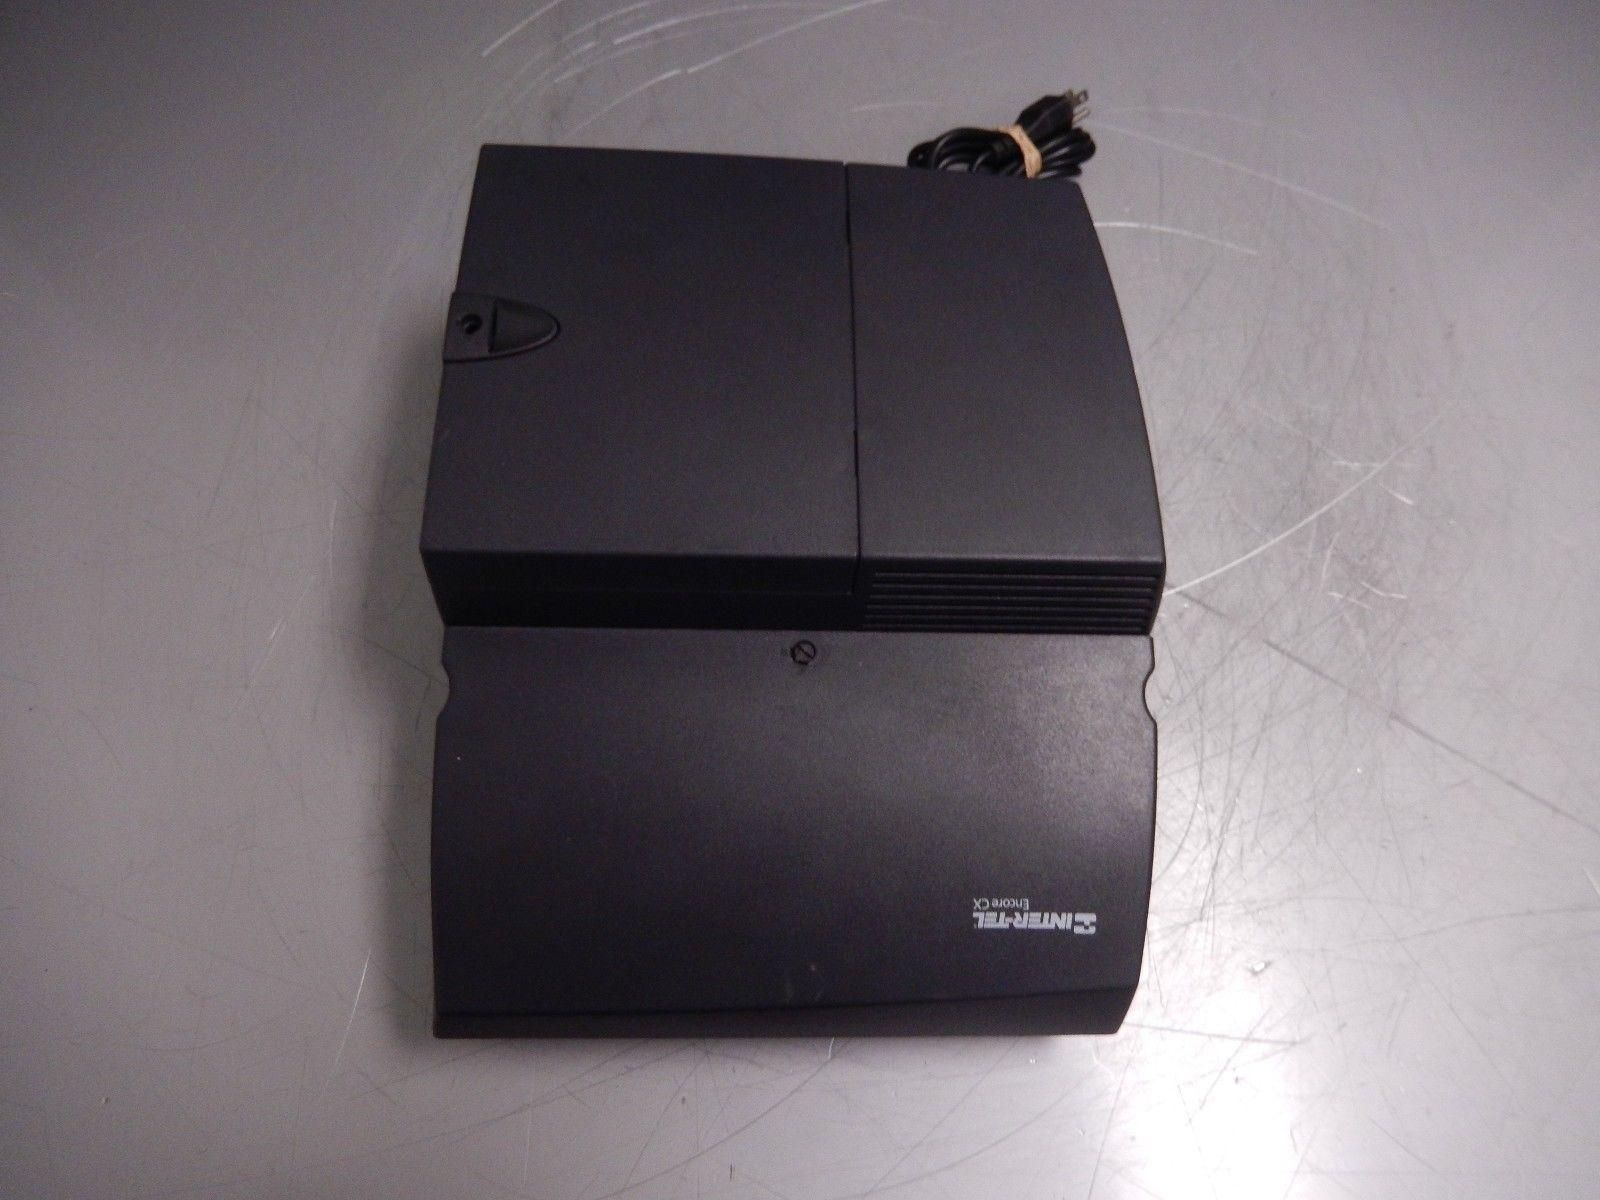 Inter-Tel Mitel 3000 Encore CX Phone KSU 20hr Voice Mail 618.5018 2x CO Modules image 3